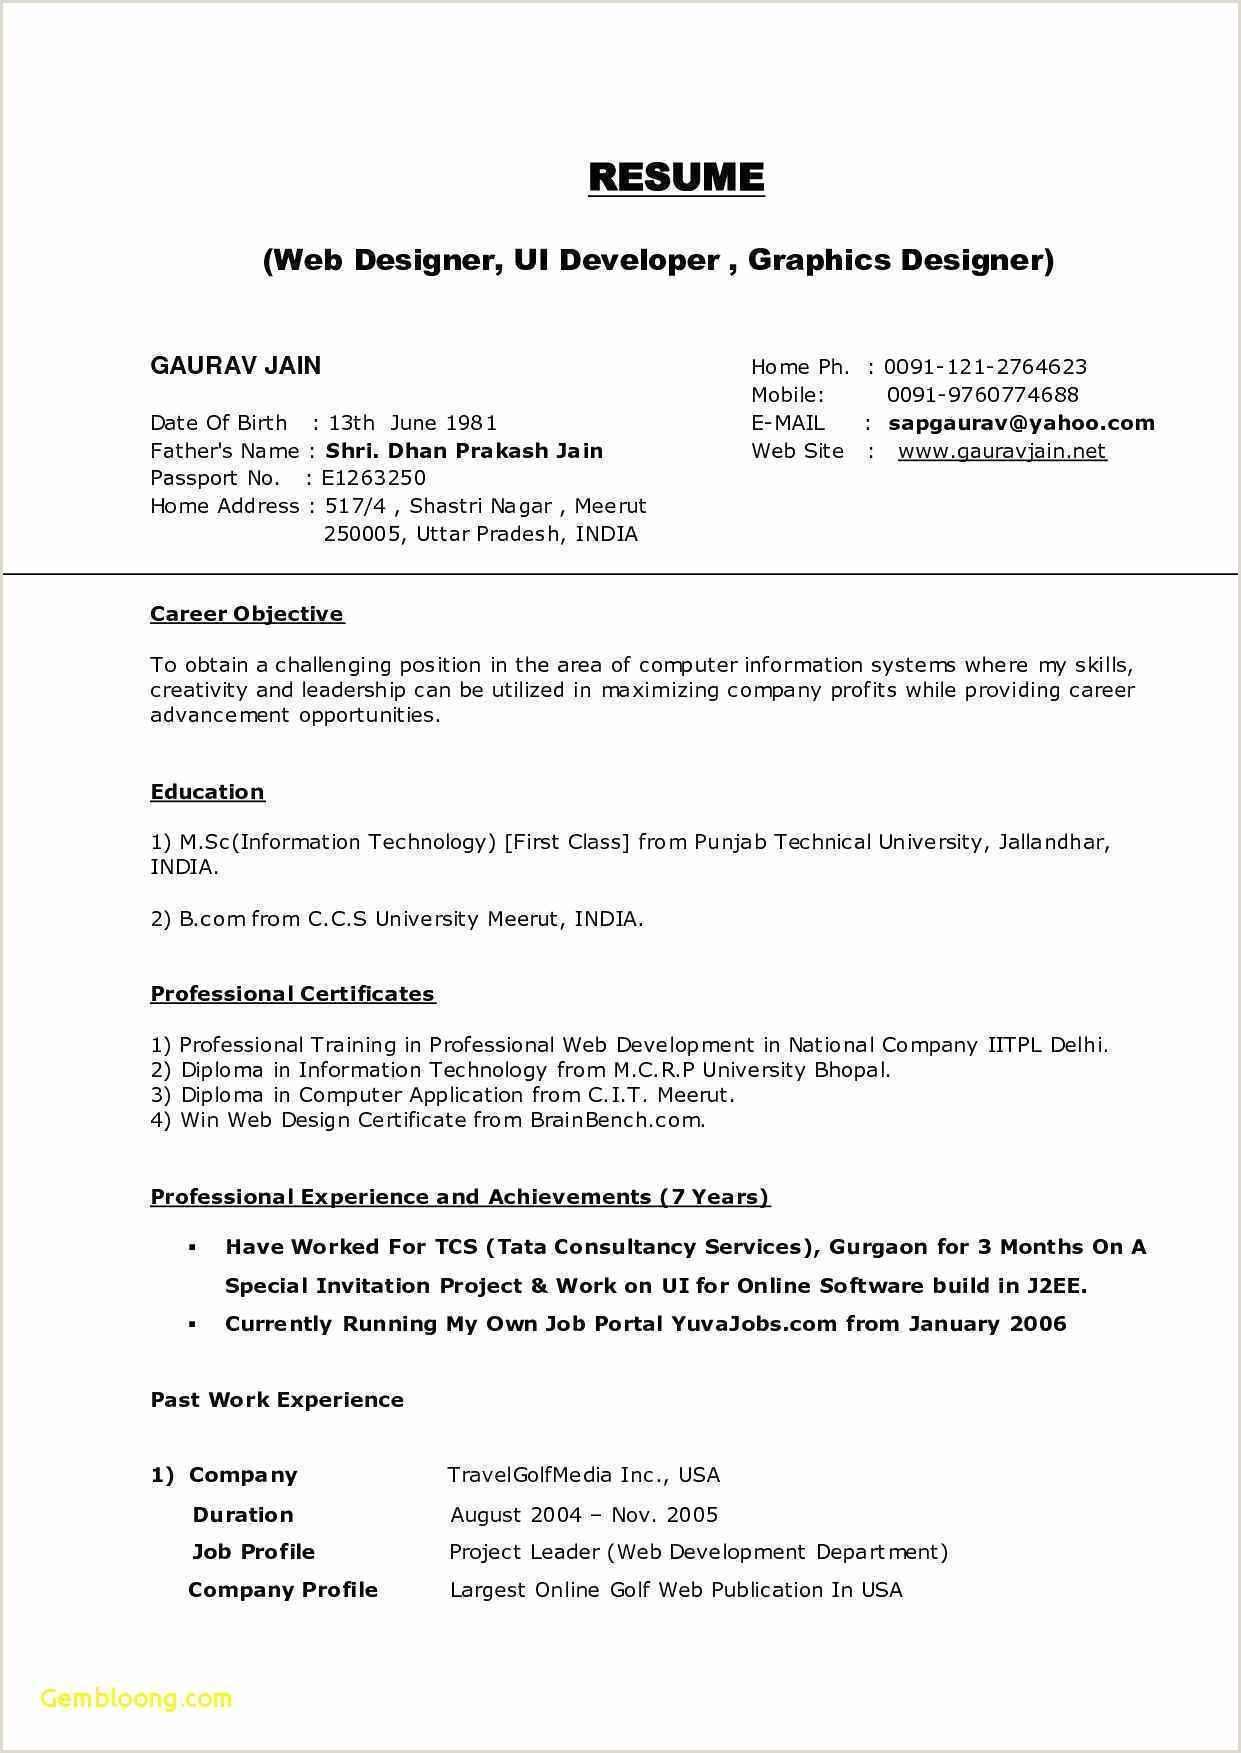 Fresher Resume format Doc in 2020 Job resume format